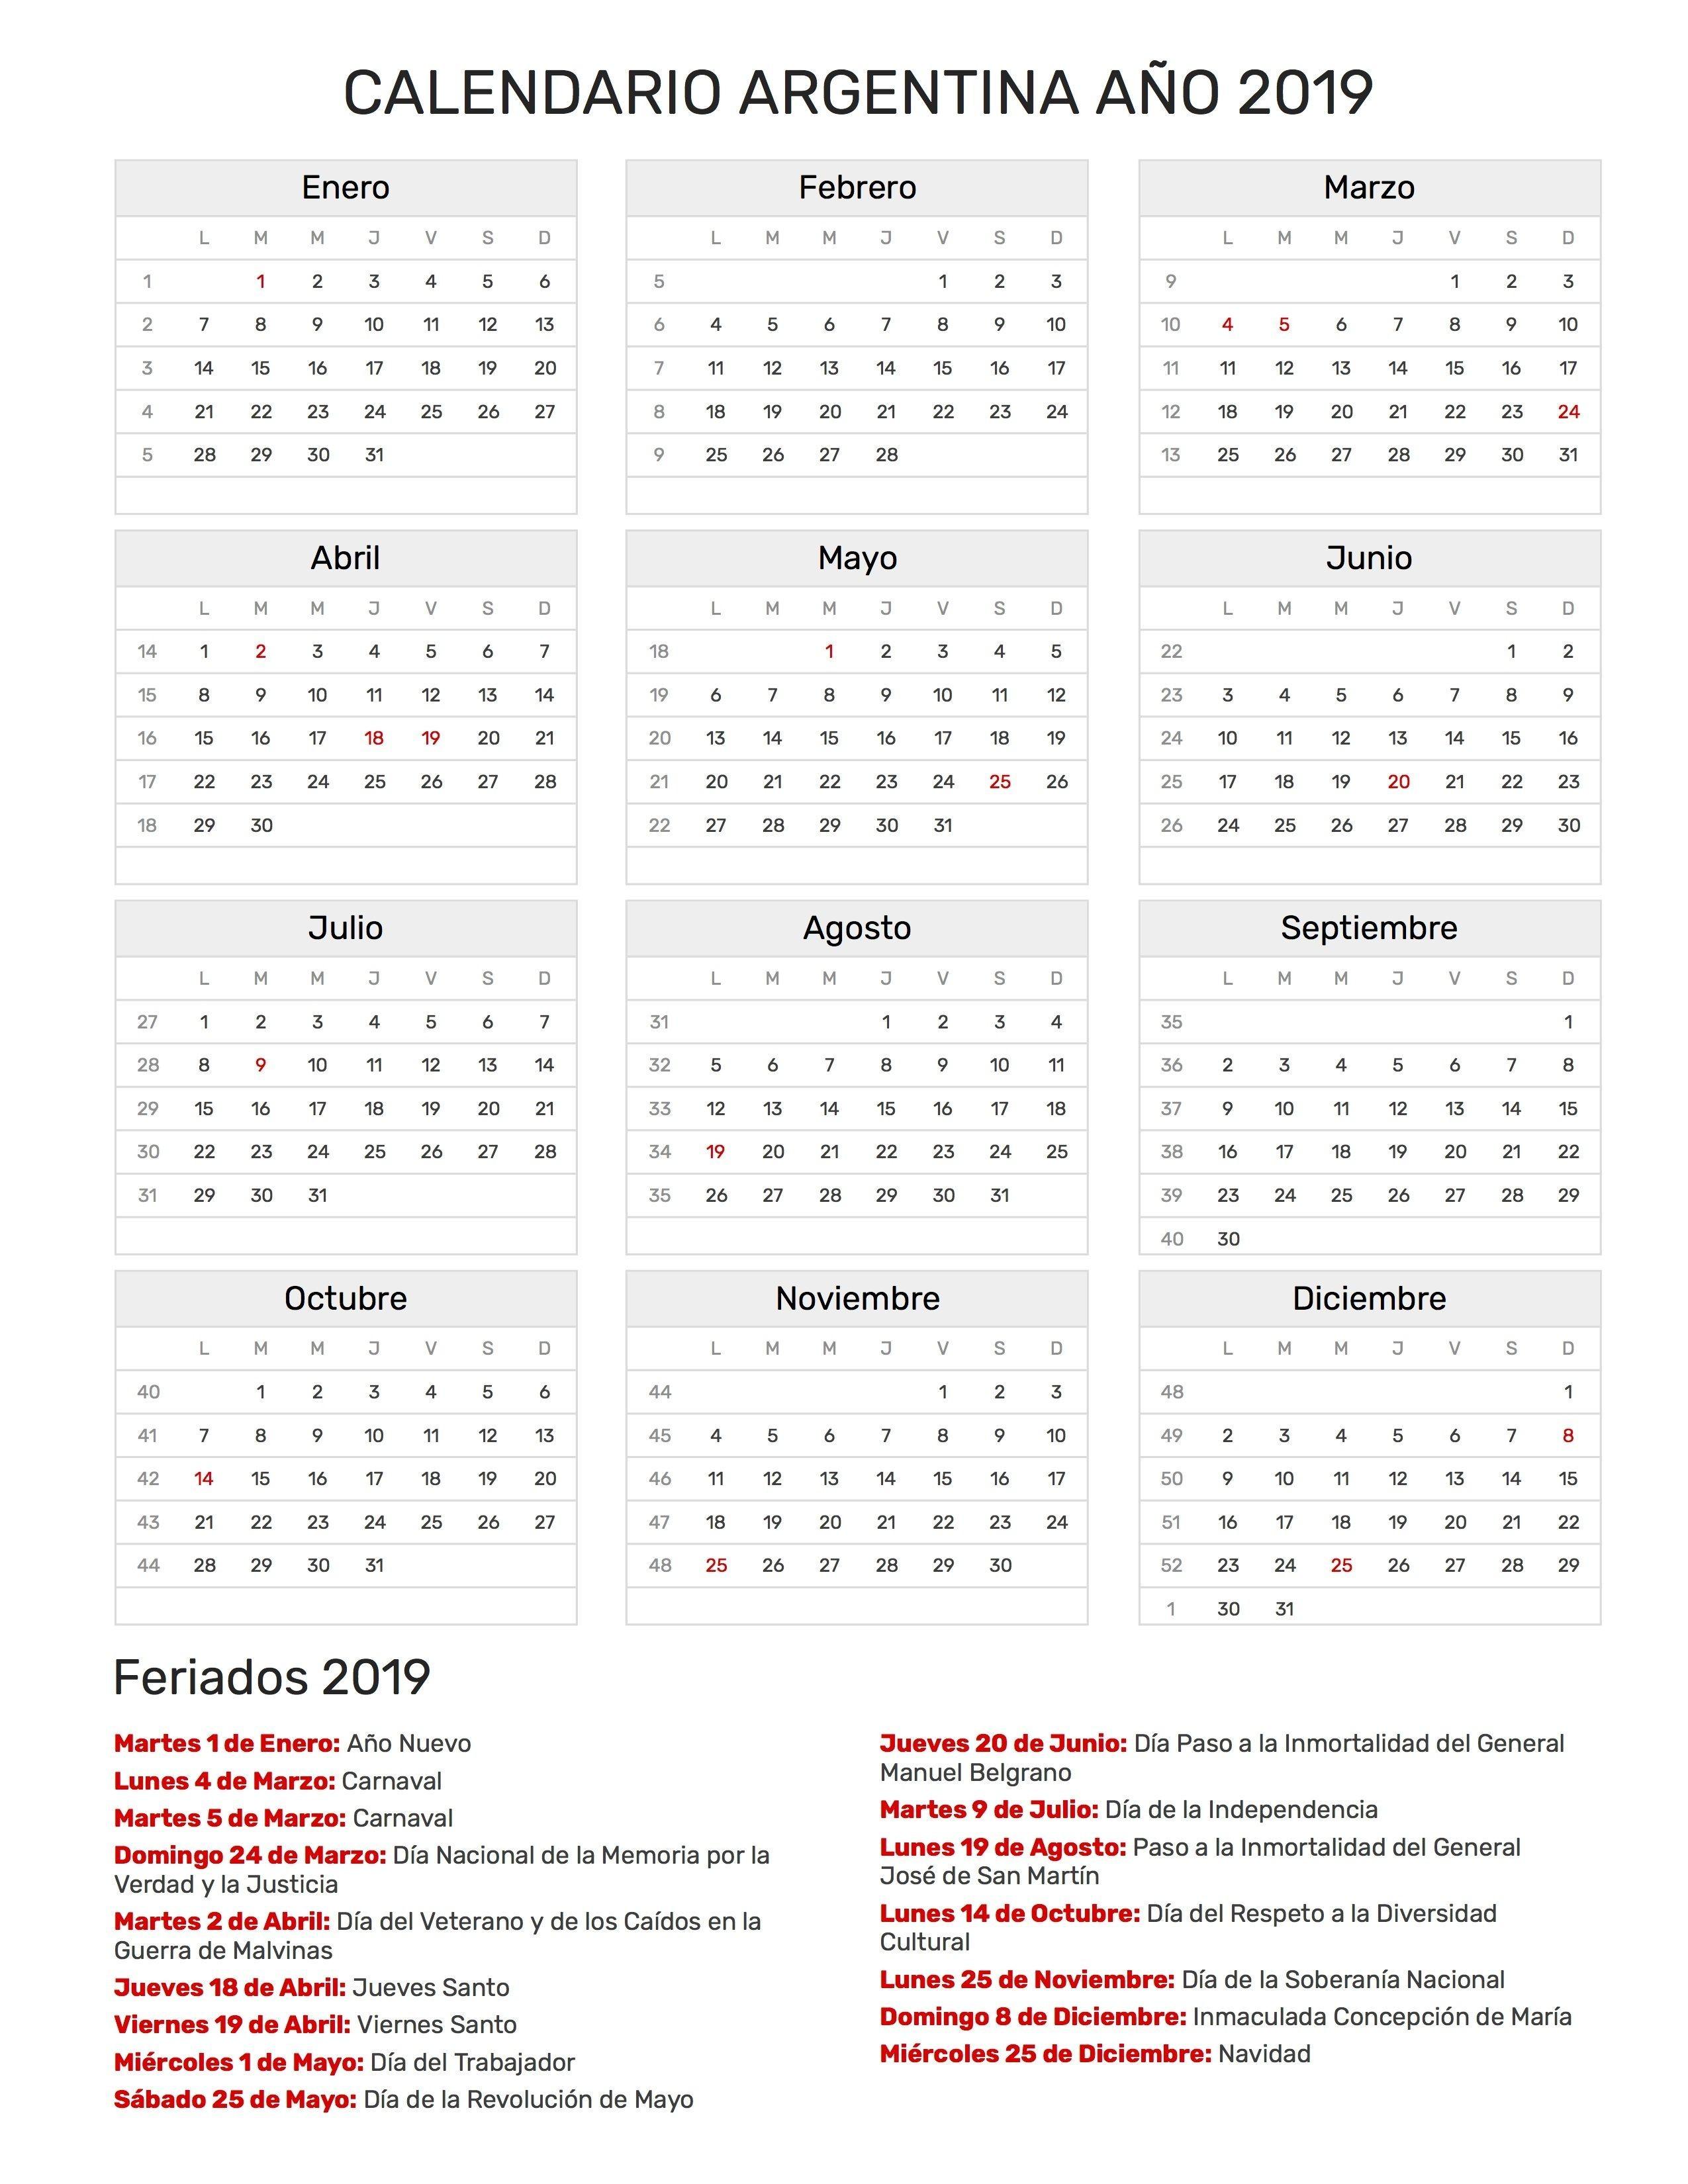 Calendario 2020 Festivos Para Colombia Más Recientes Calendario Diciembre De 2019 53ld Calendario T